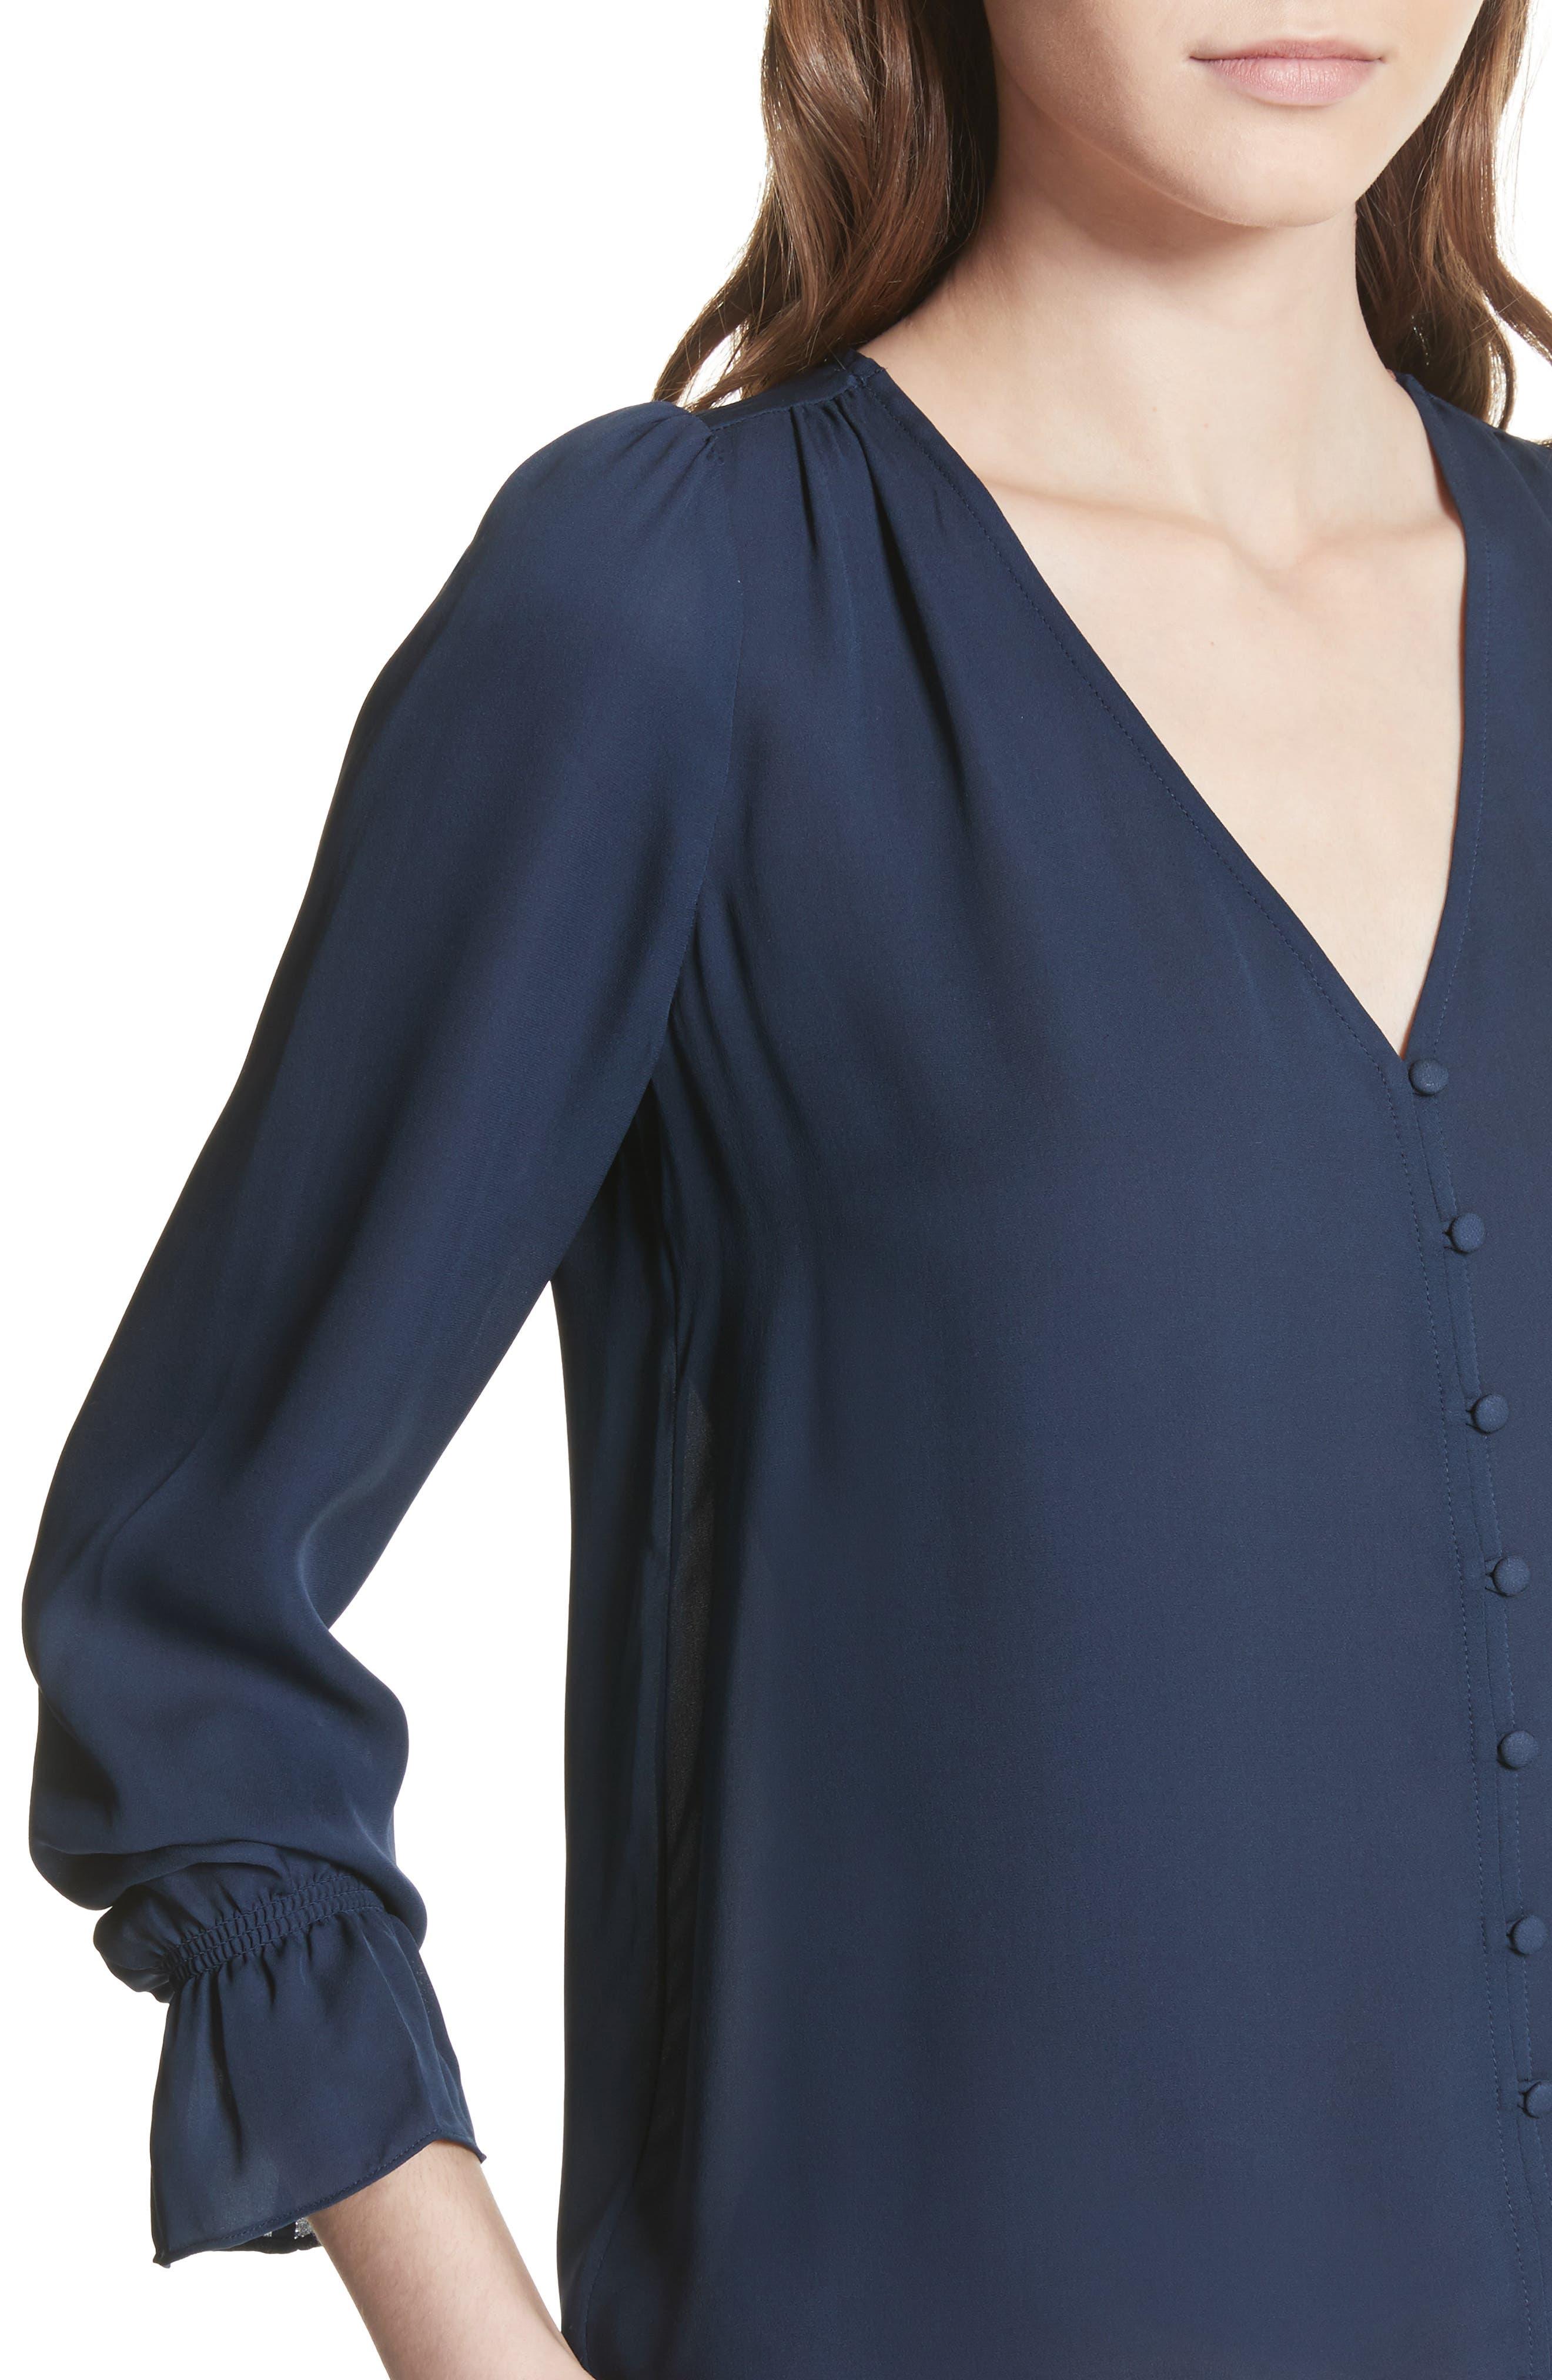 Bolona Silk Gathered Sleeve Top,                             Alternate thumbnail 4, color,                             410